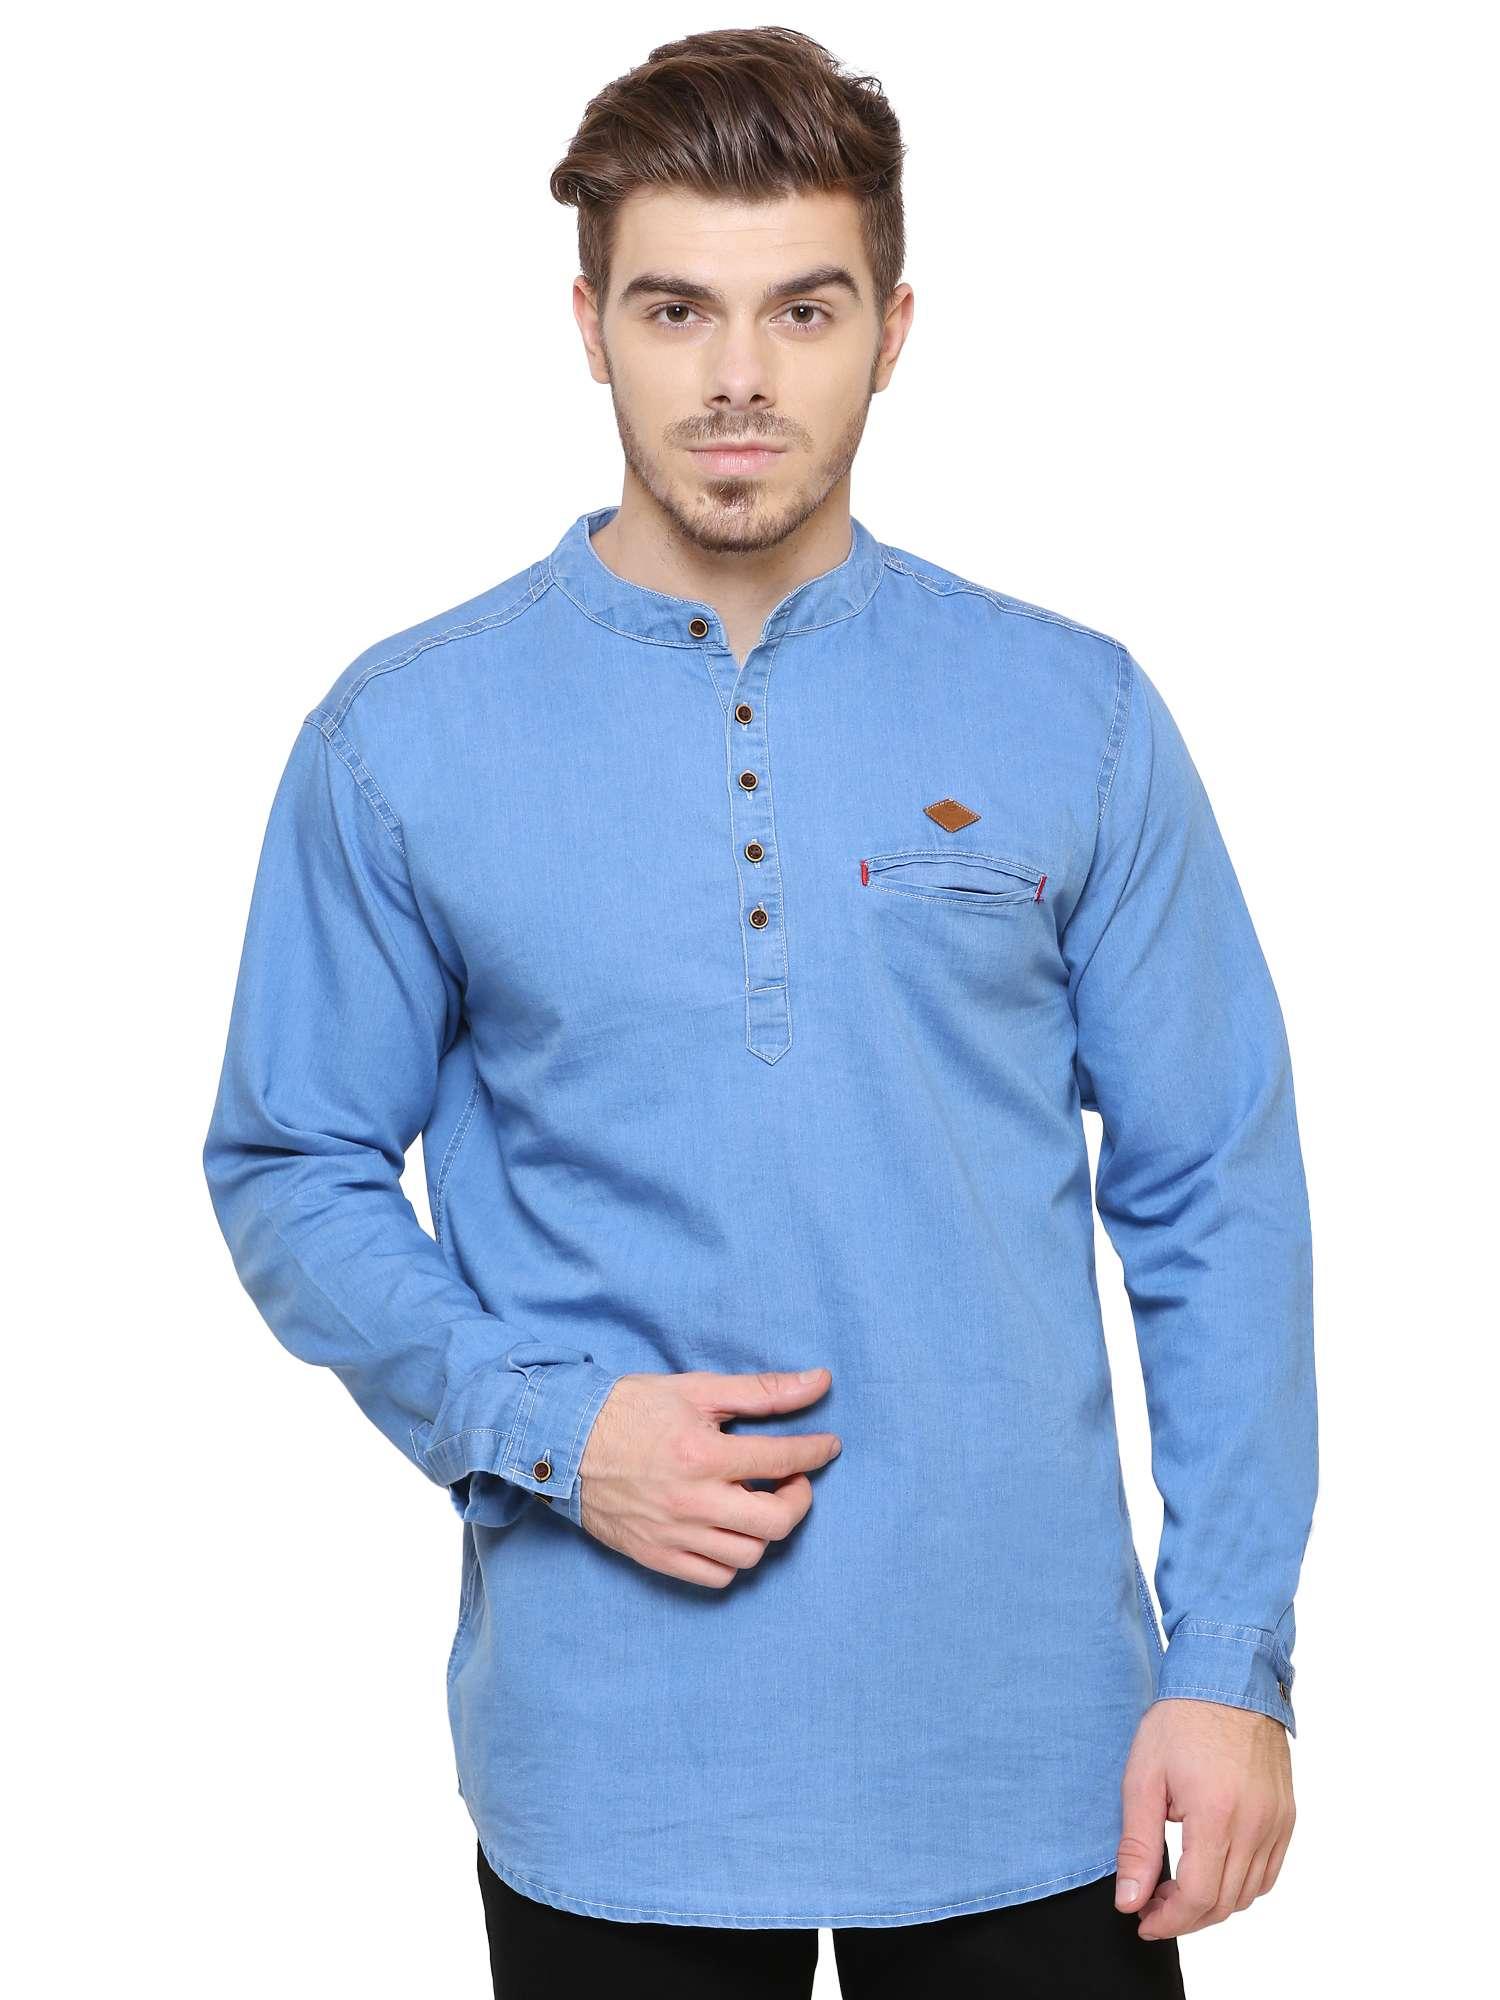 Kuons Avenue Men's Light Blue Denim Solid Casual Kurta Shirt